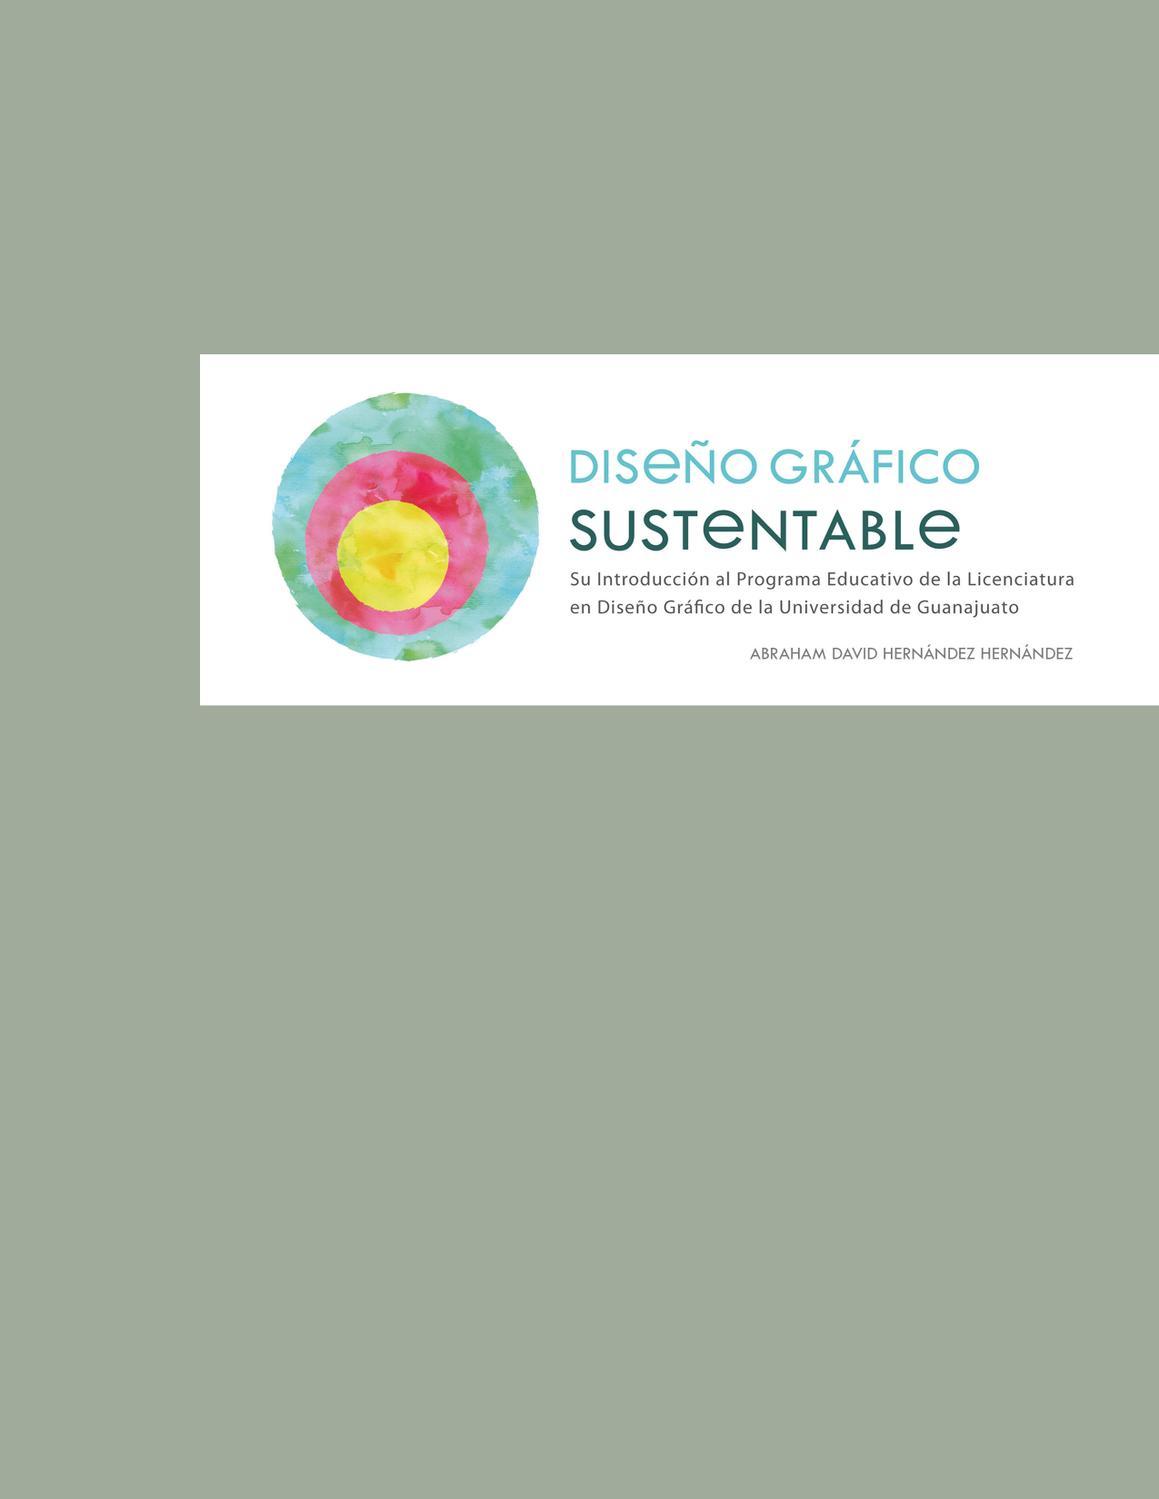 Issuu tesis dise o gr fico sustentable by abraham hdez for Diseno grafico universidades